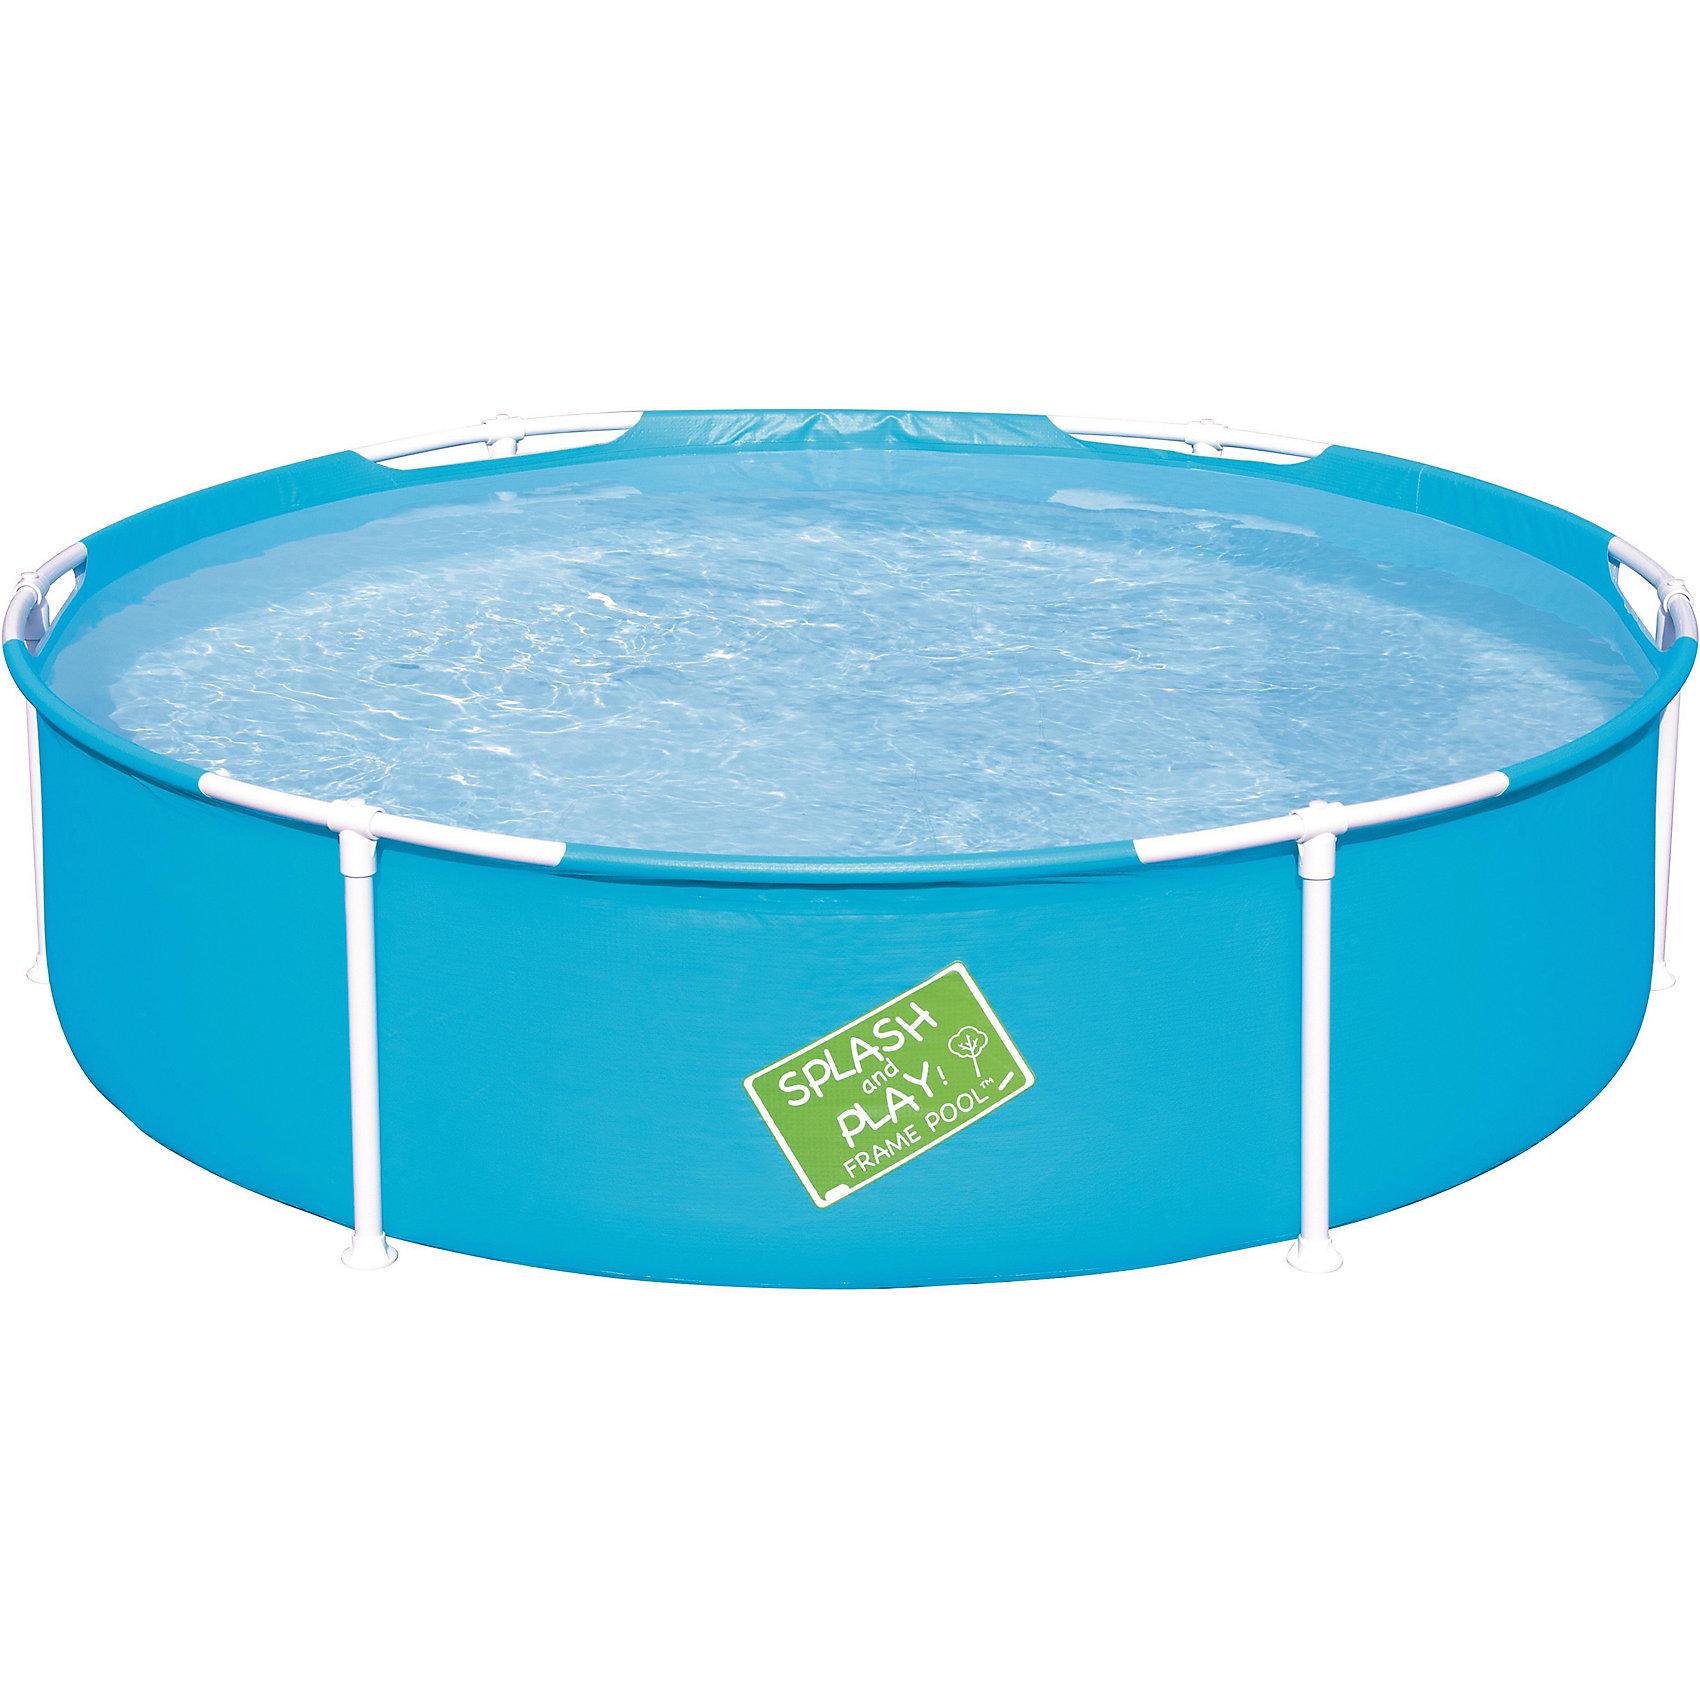 Bestway Детский каркасный бассейн 580л, Bestway